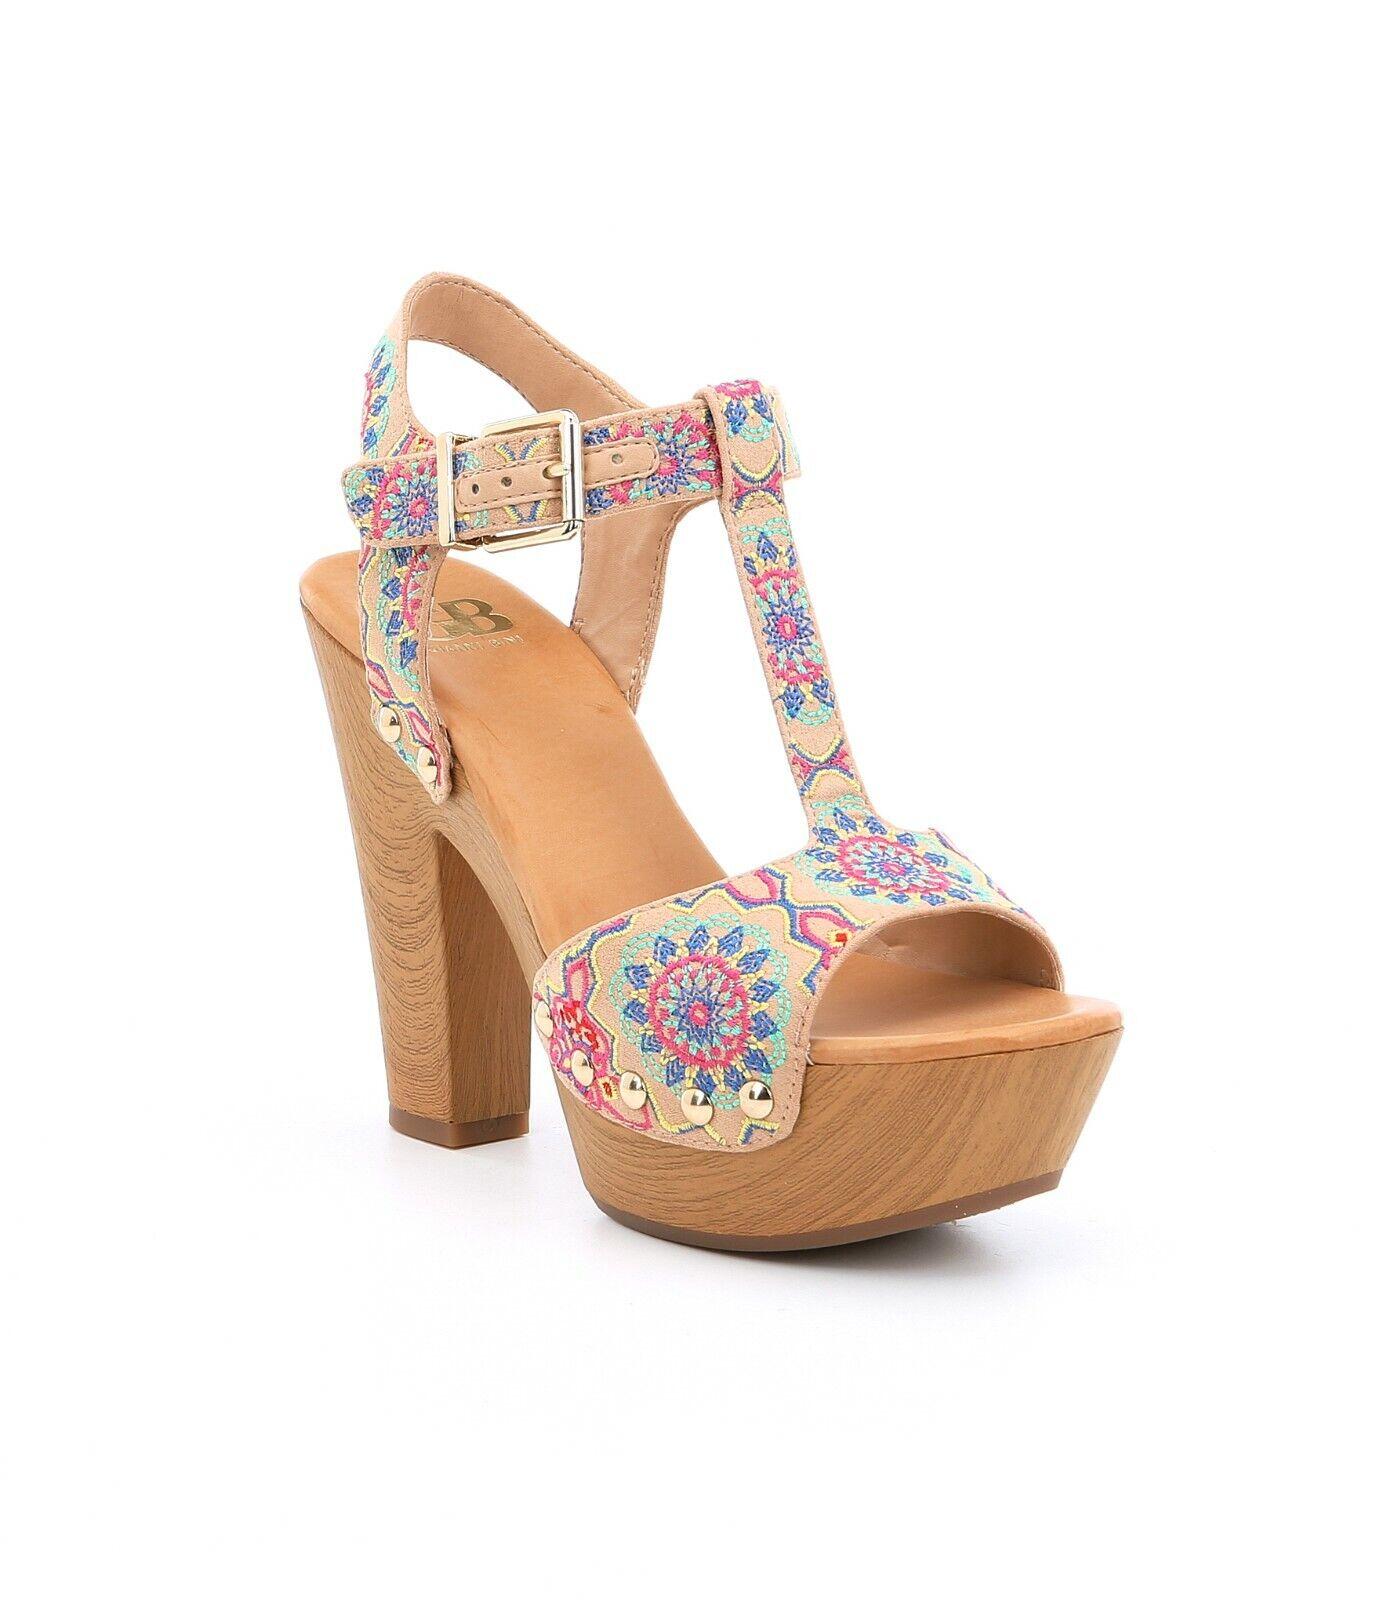 GB Gianni Bini En -Chant donna Dimensione 8M Boho  Emmooidery Platform Block Heel Sandal  risparmia fino al 70%